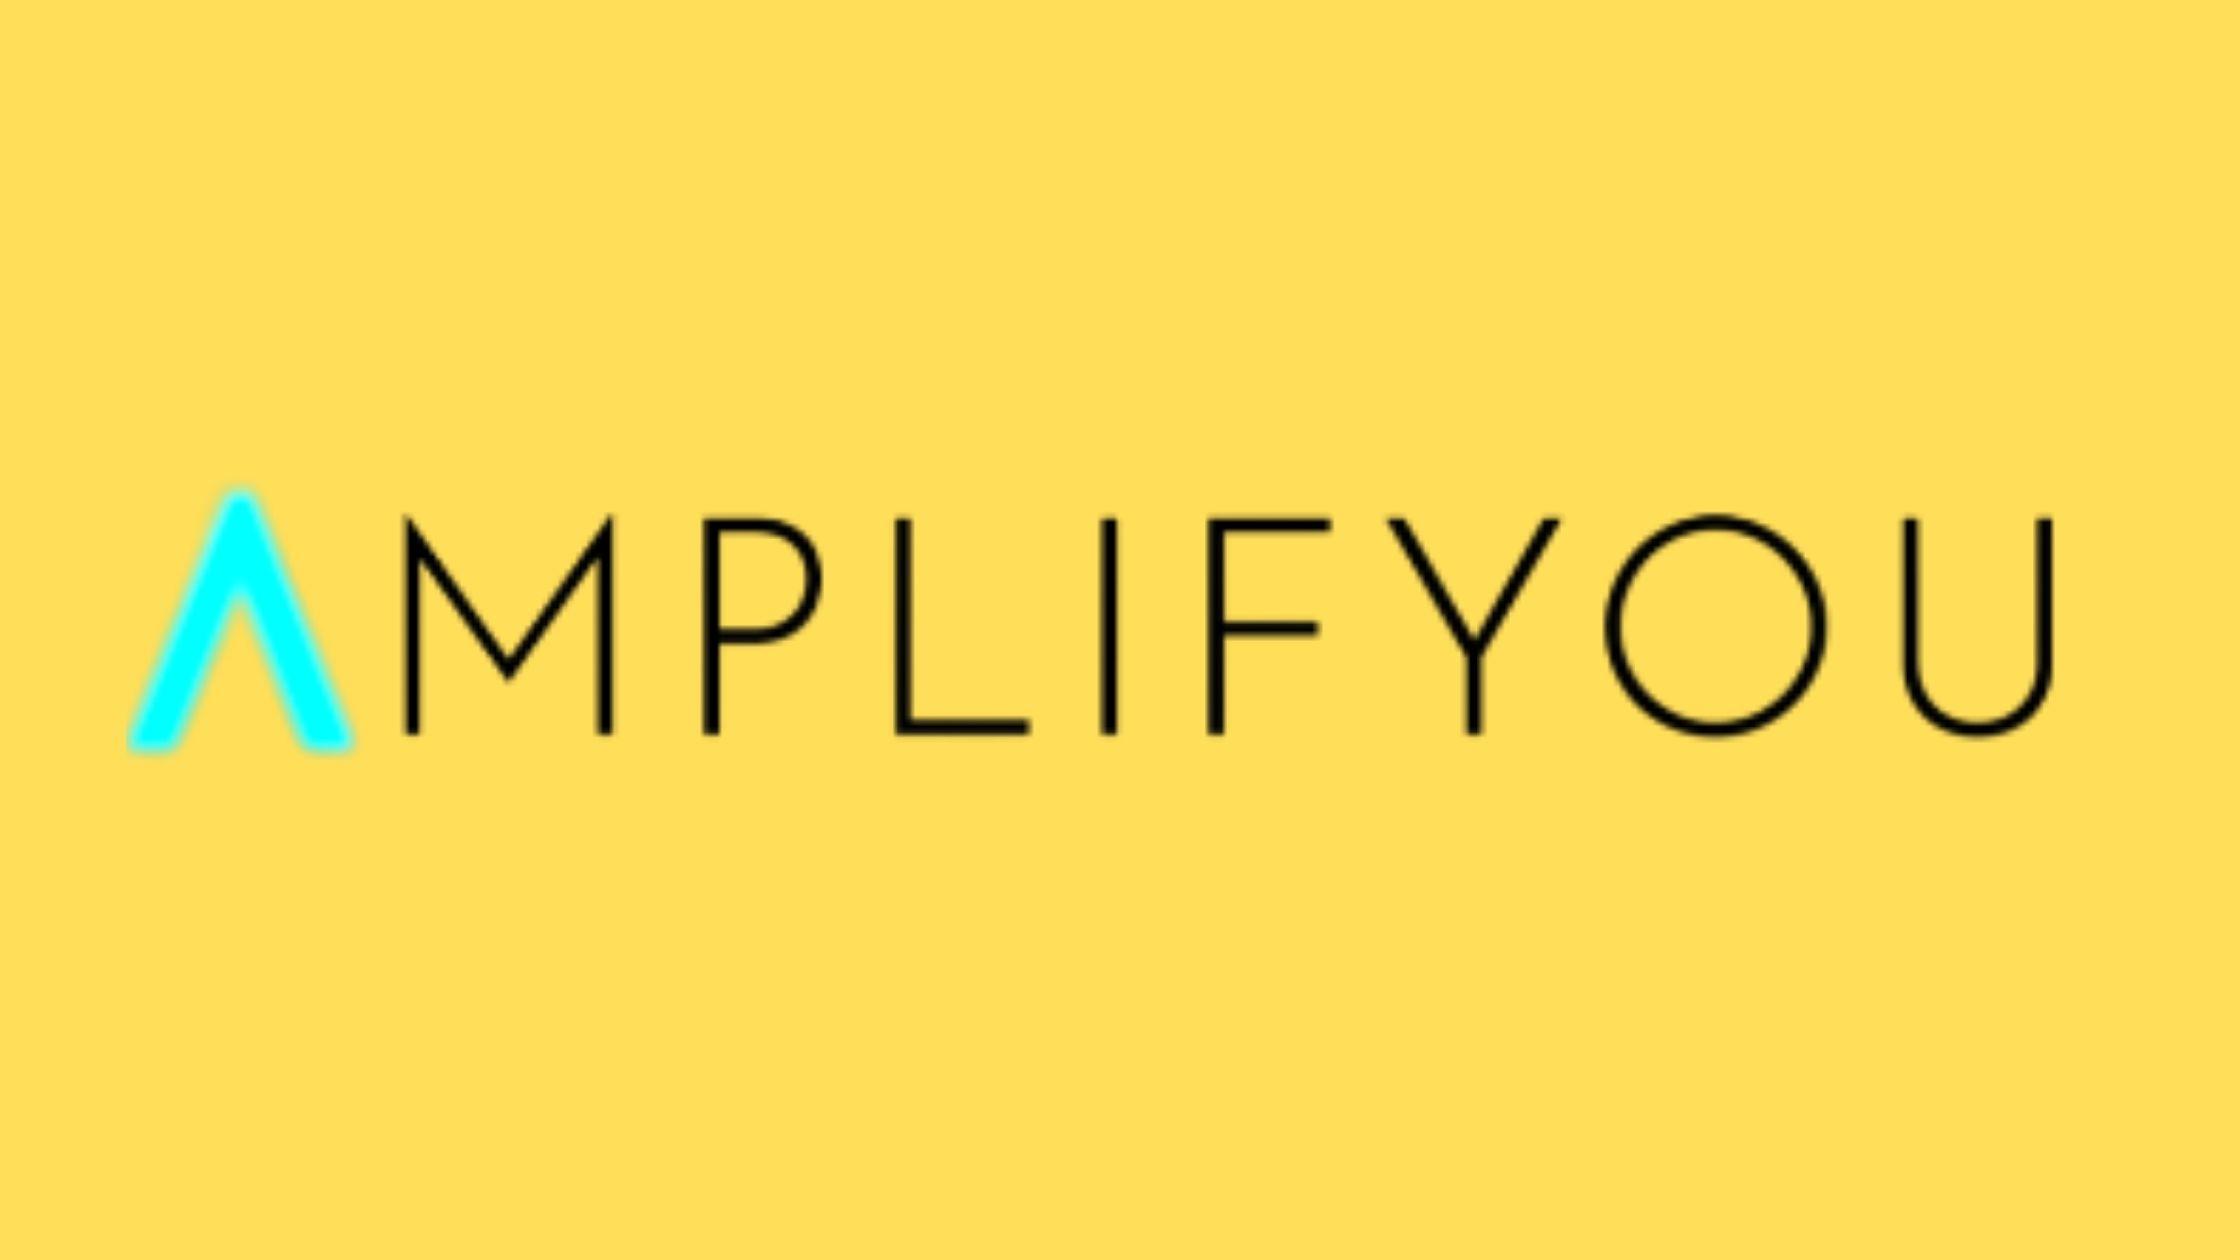 Amplfyou